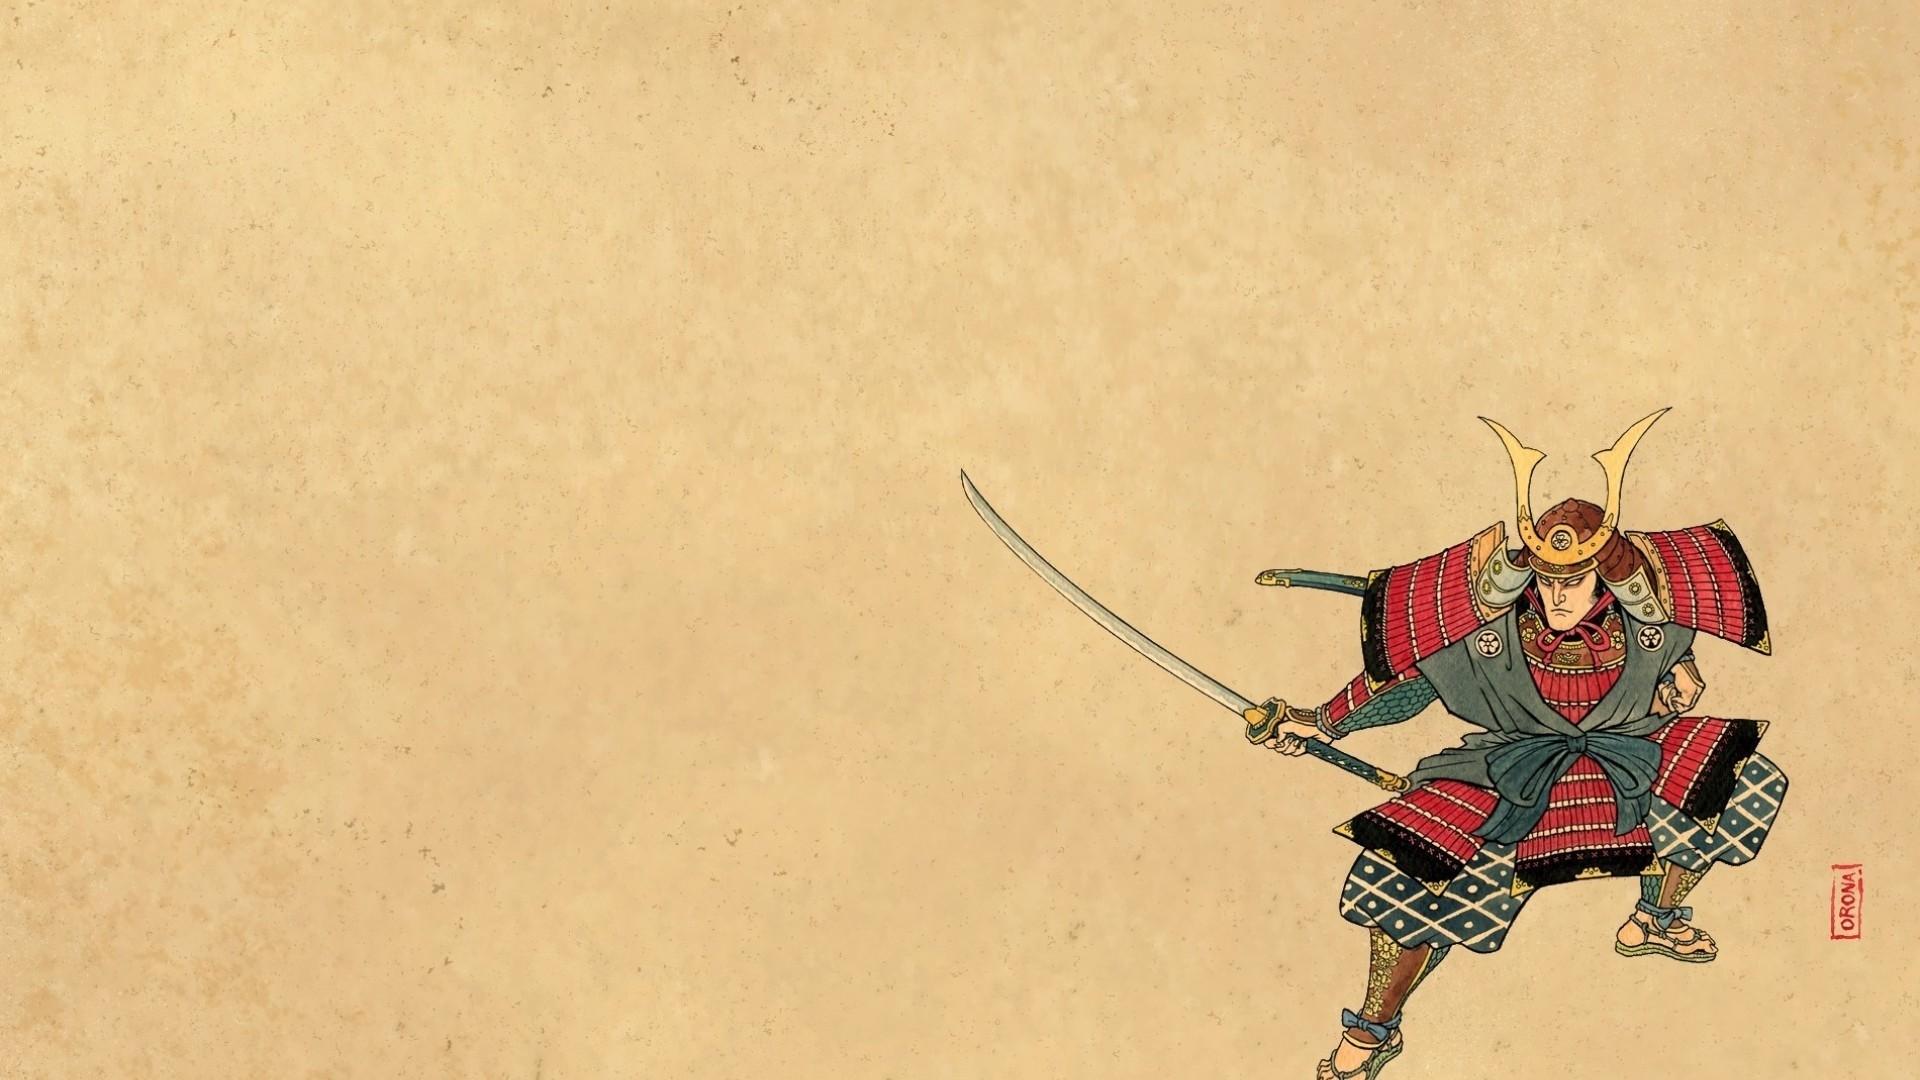 Samurai Wallpaper and Background